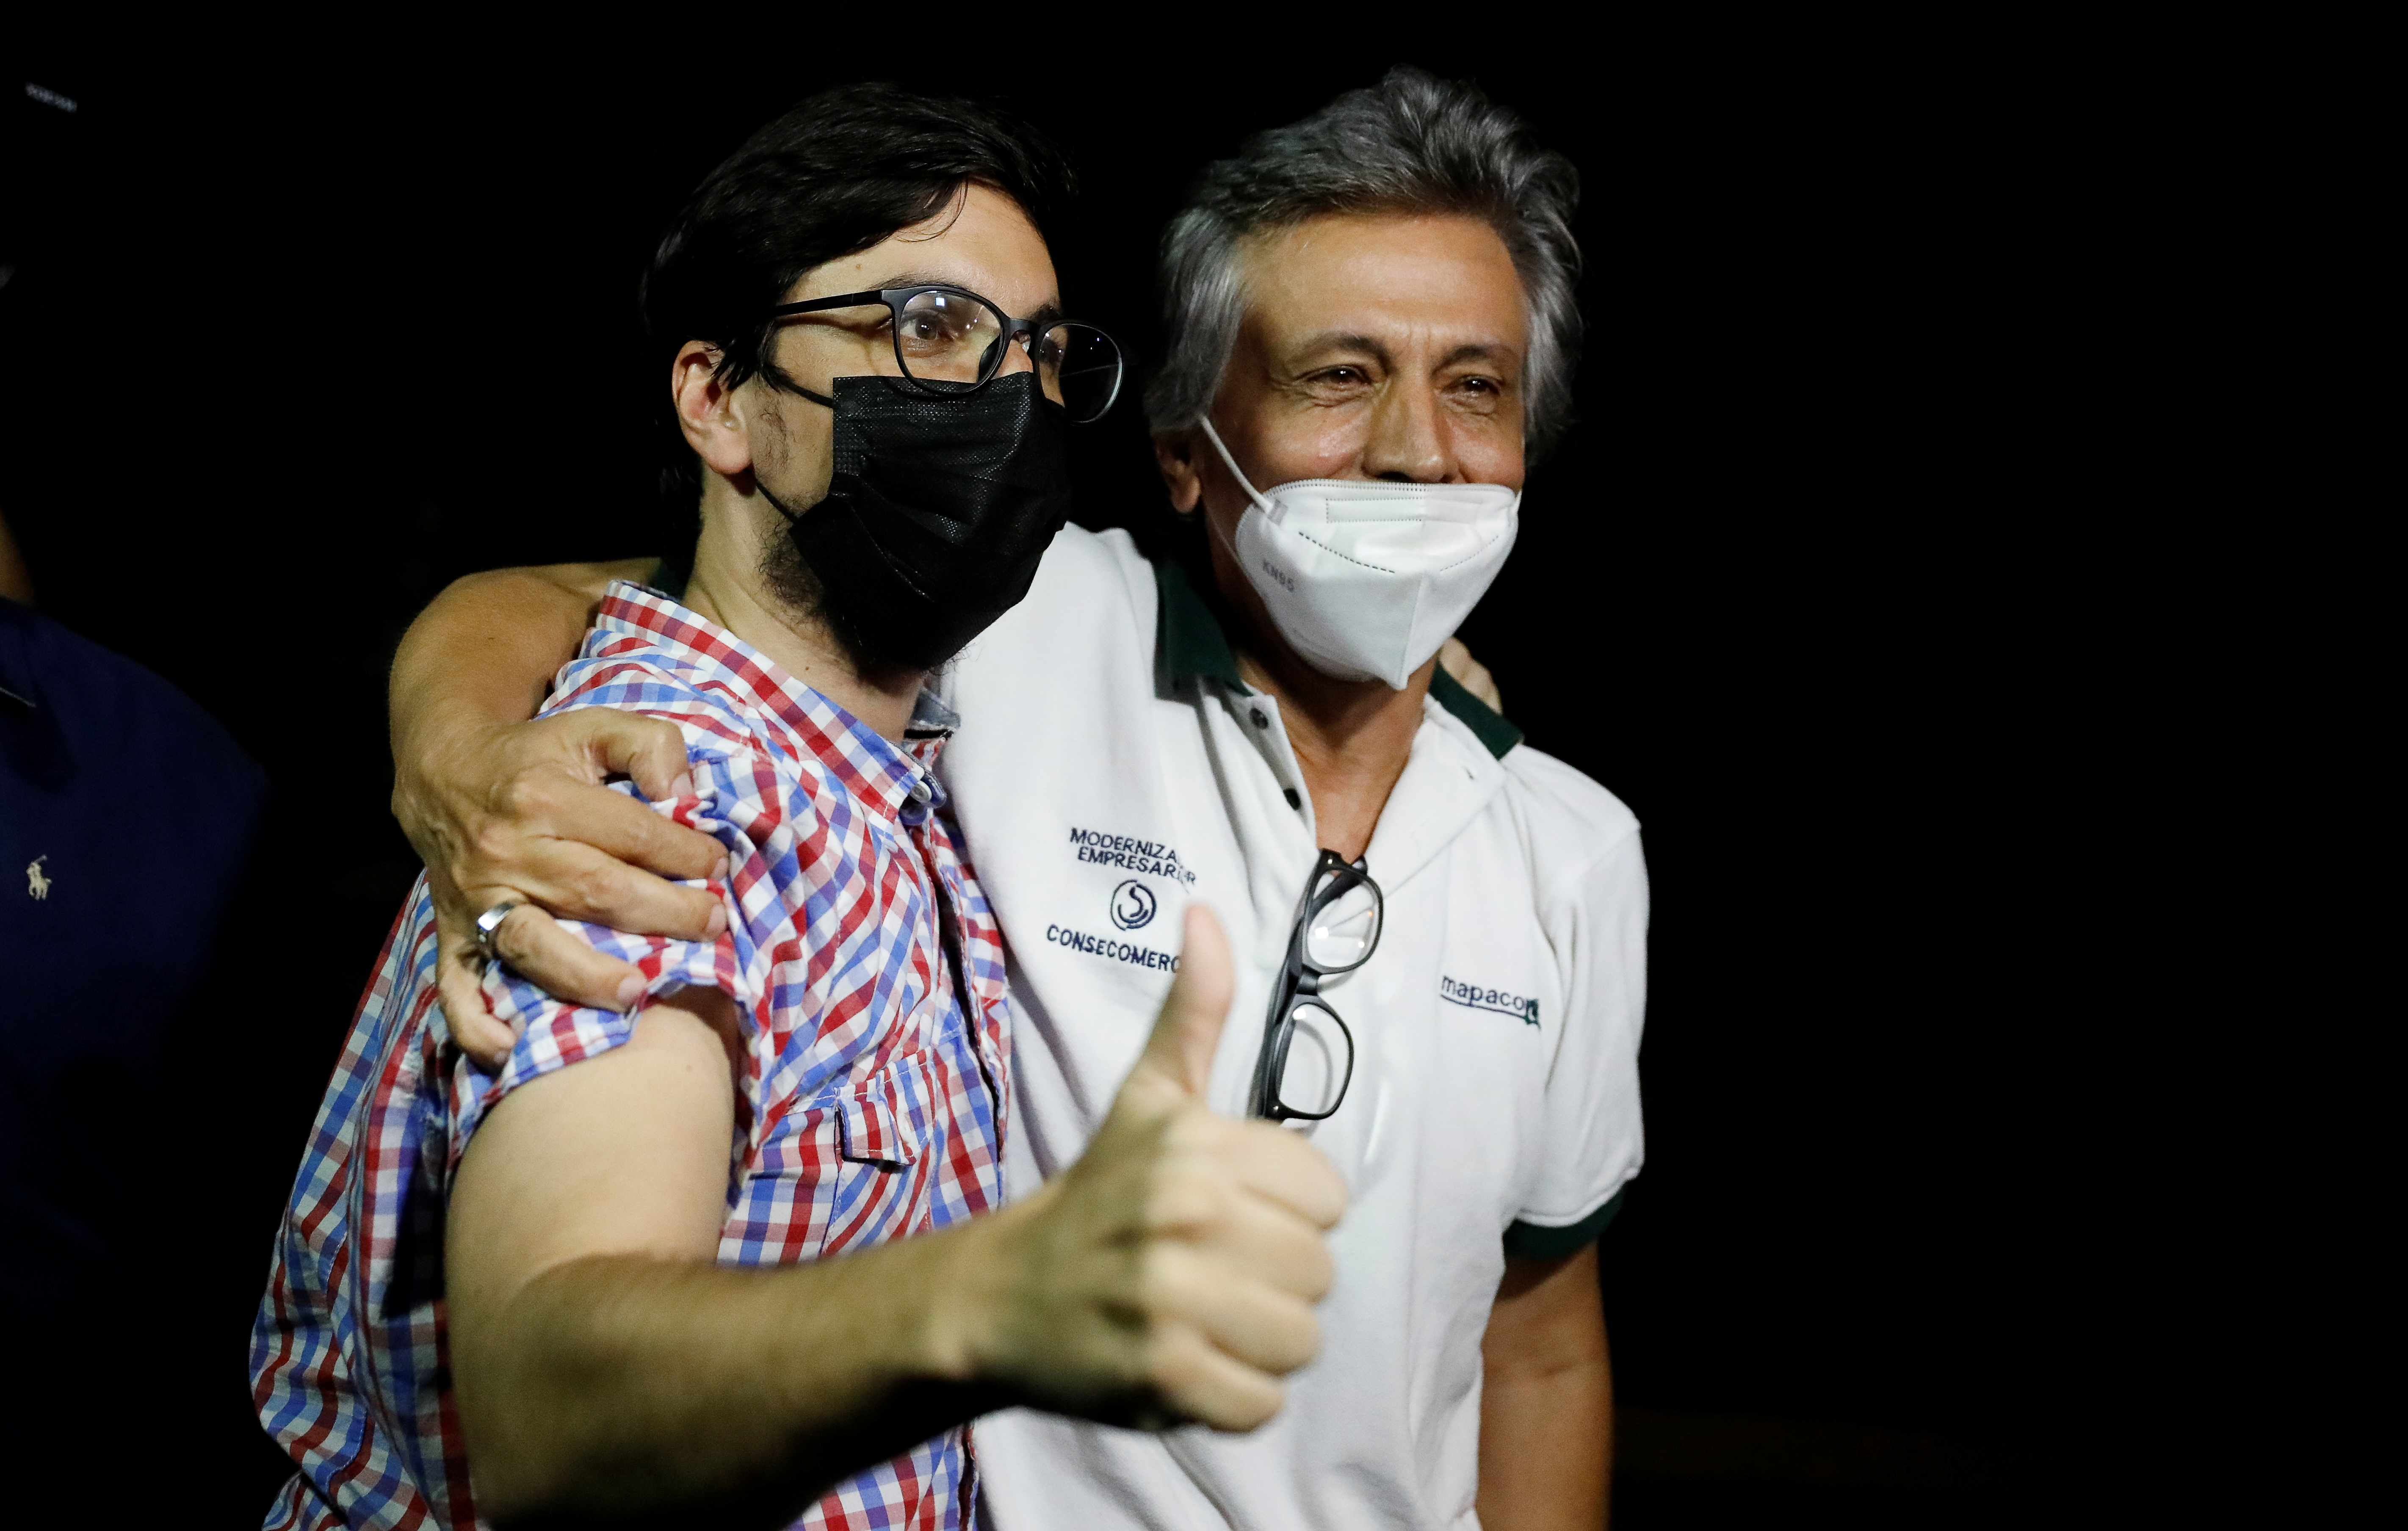 Venezuelan opposition leader Freddy Guevara gestures as he hugs his father after leaving